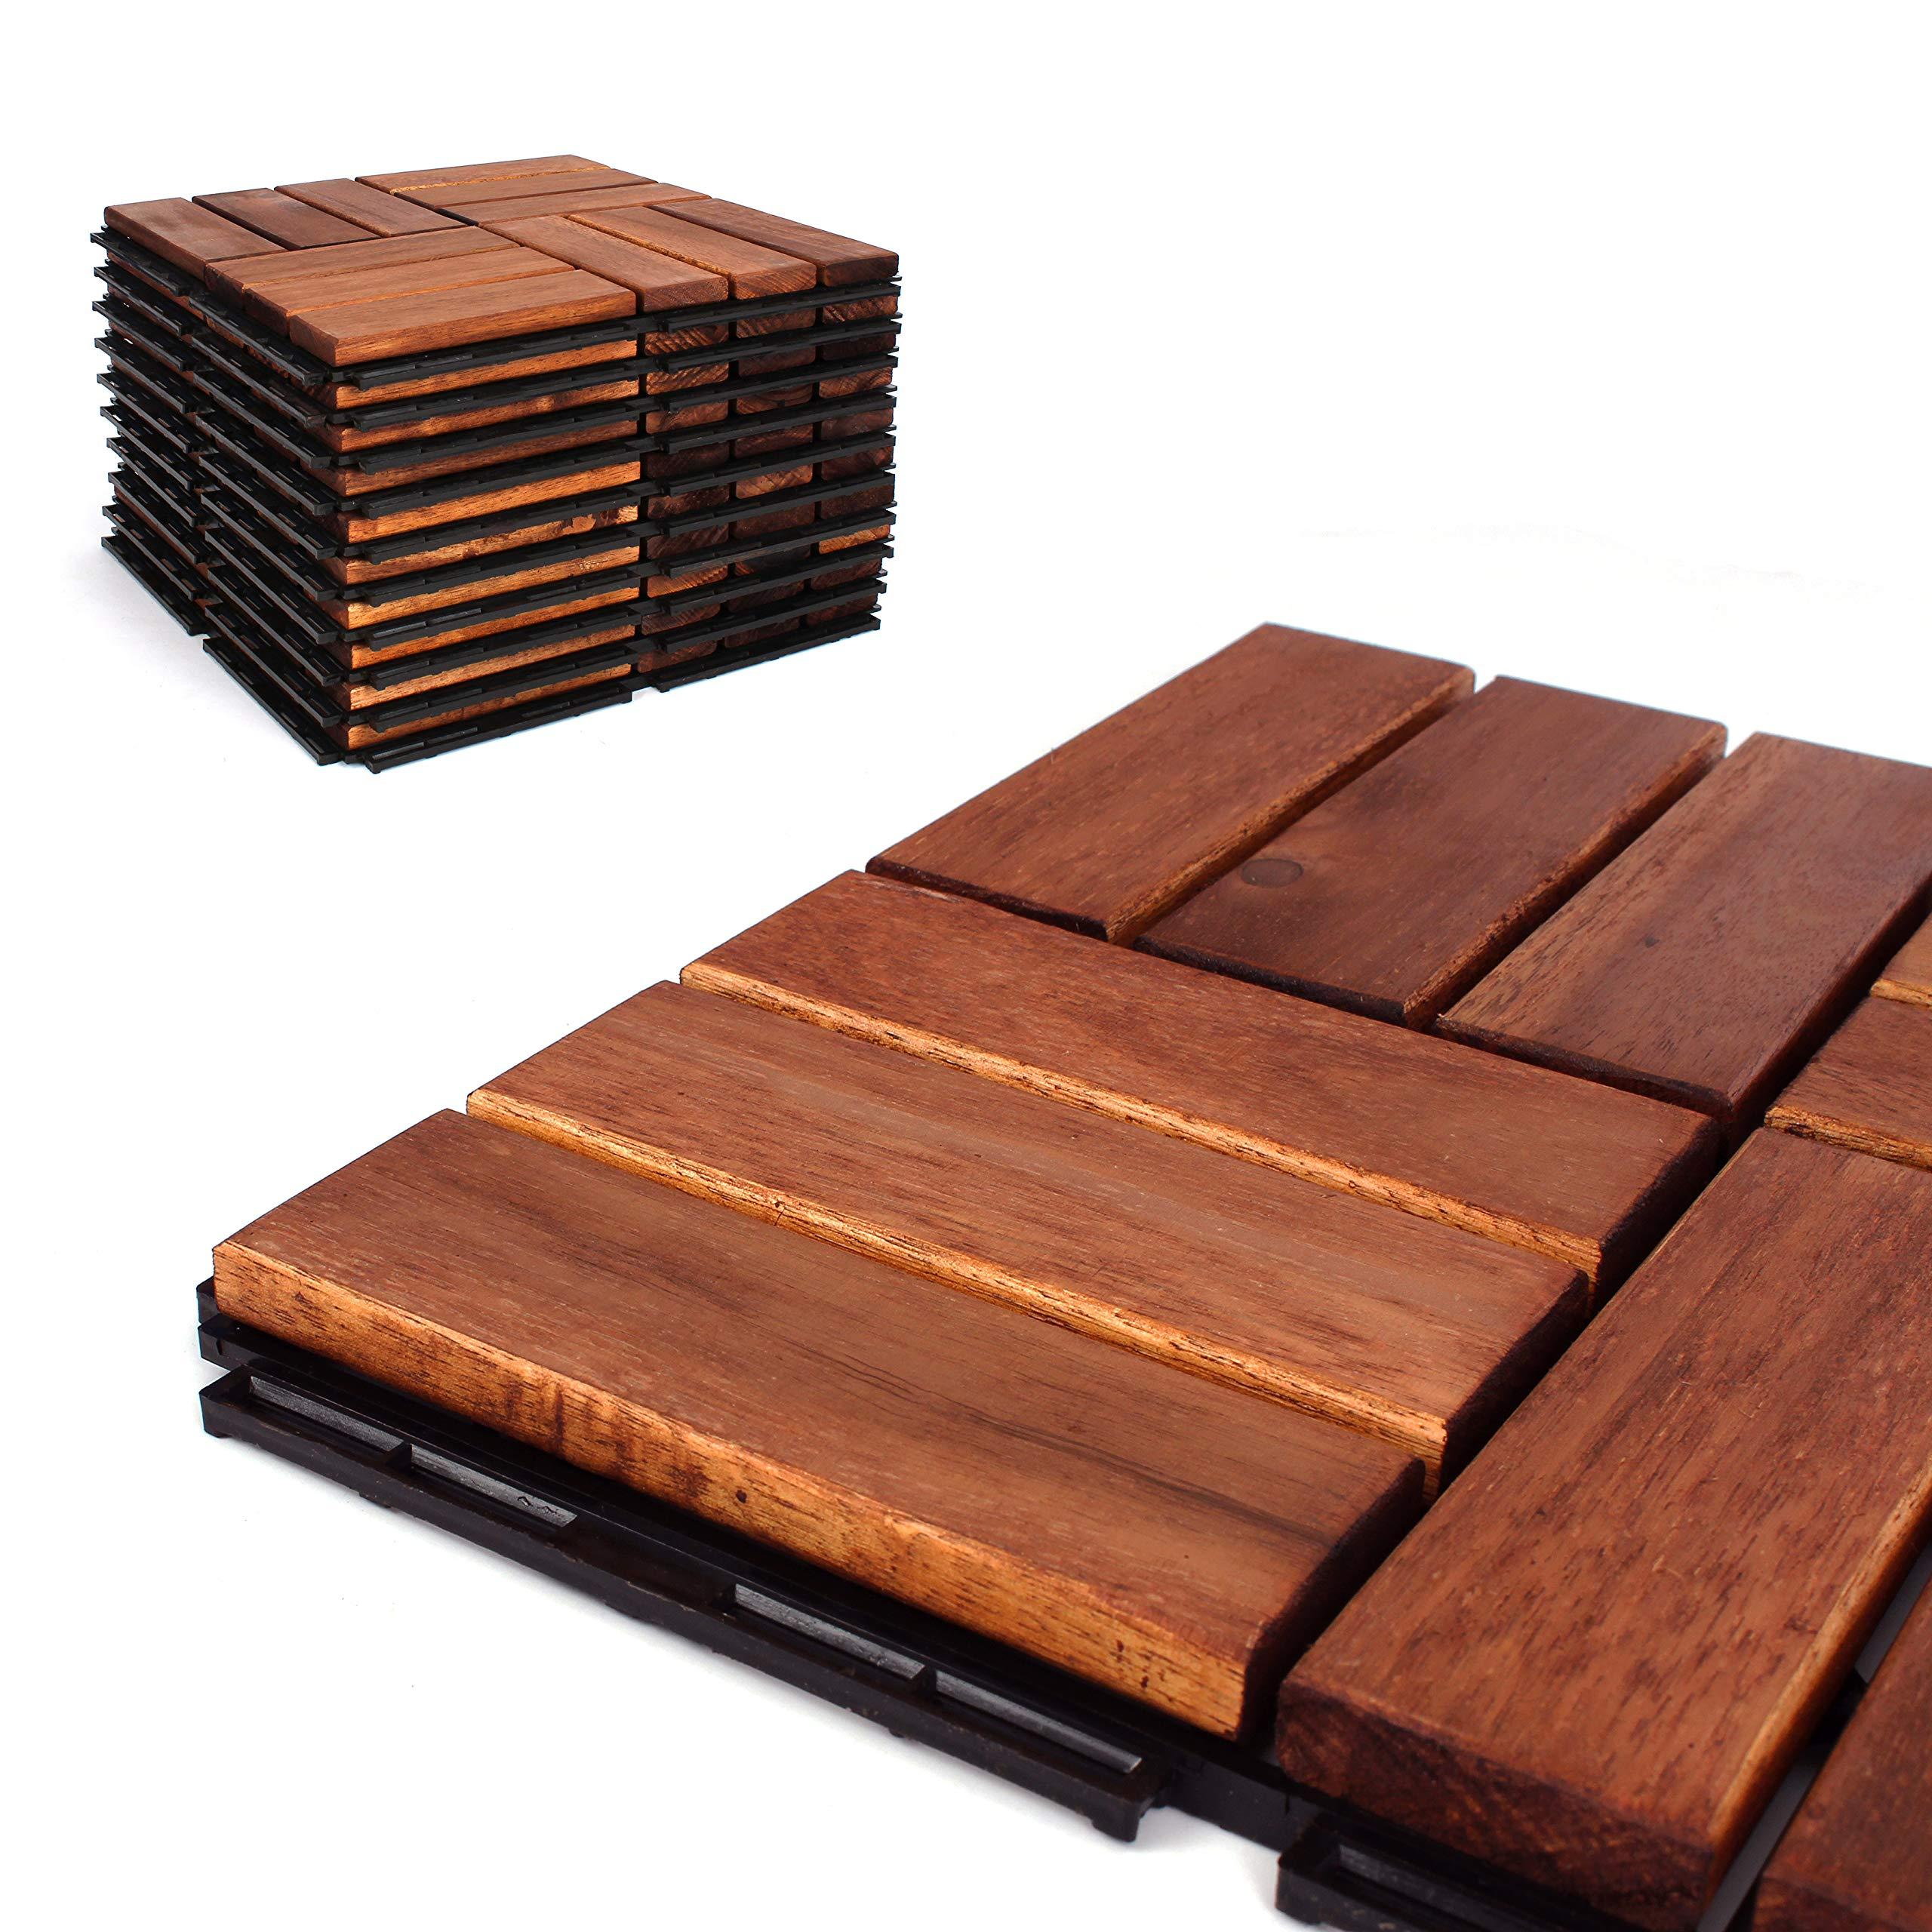 Deck Tiles - Patio Pavers - Acacia Wood Outdoor Flooring - Interlocking Patio Tiles - 12''x12'' (6 Pack) - Oiled Acacia Finish - Checker Pattern Decking